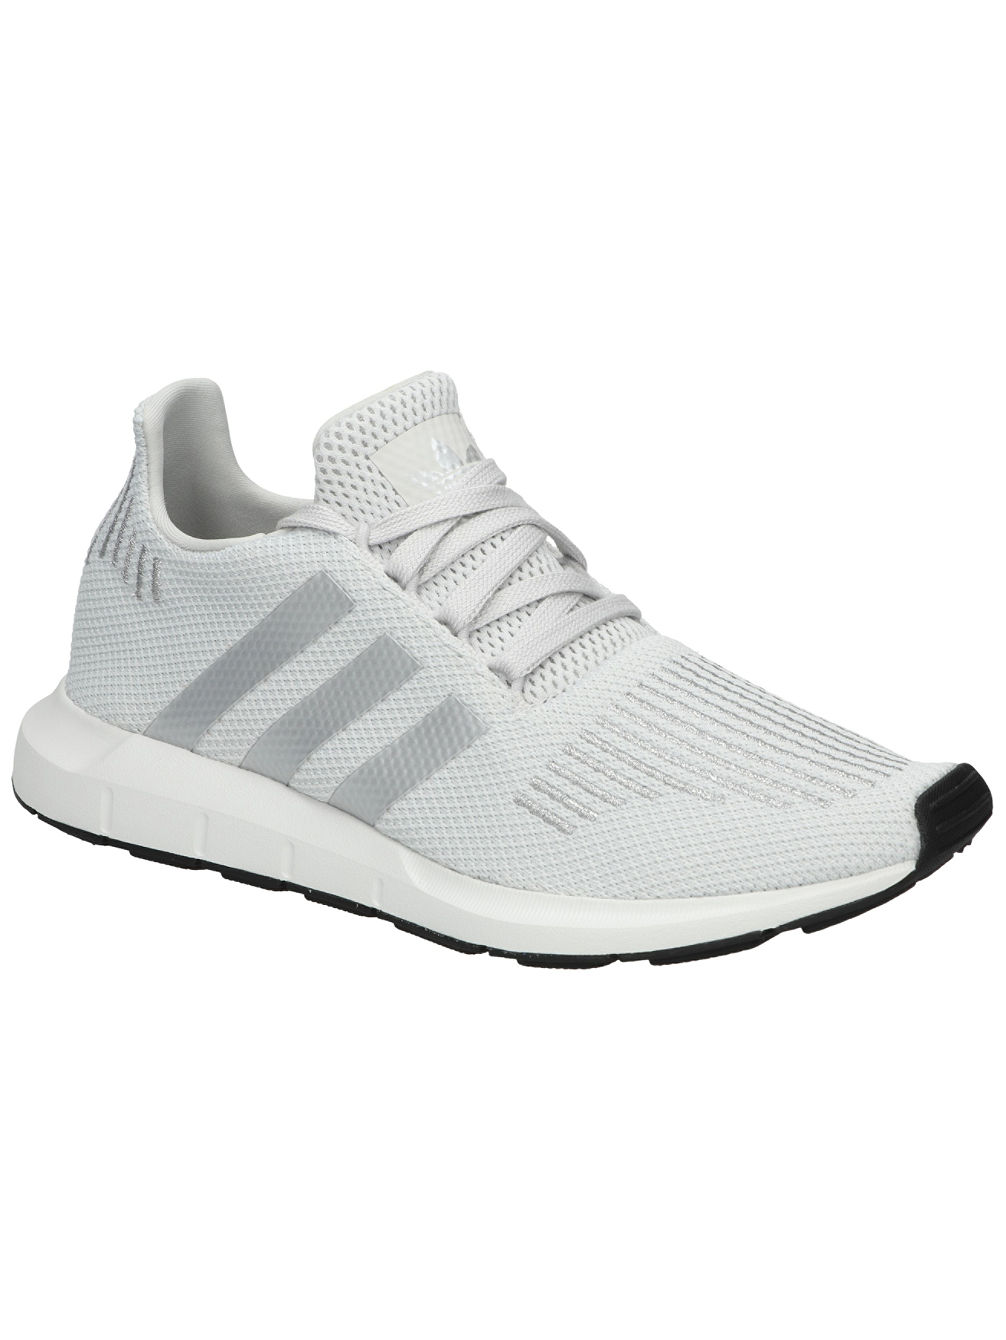 d3b7ecb754159e adidas Originals Swift Run W Sneakers Frauen online kaufen bei Blue Tomato